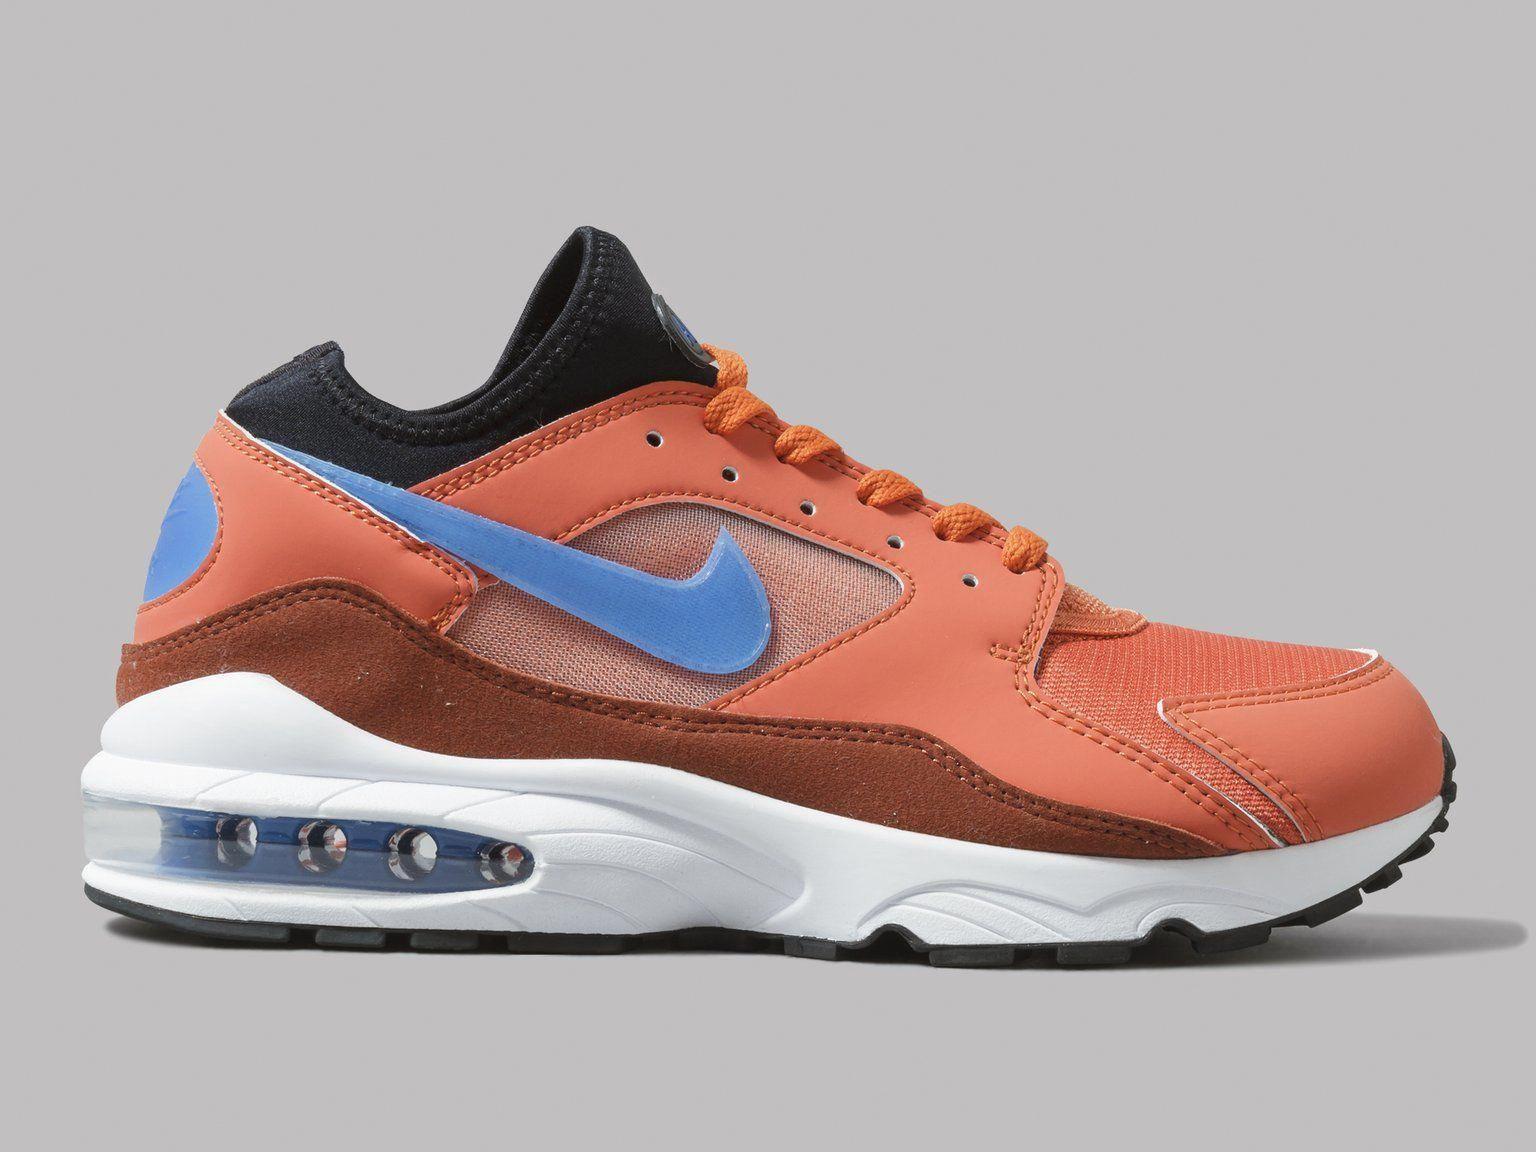 buy online 638c2 73834 Nike Air Max 93 (Vintage Coral  Blue Nebula  Mars Stone)